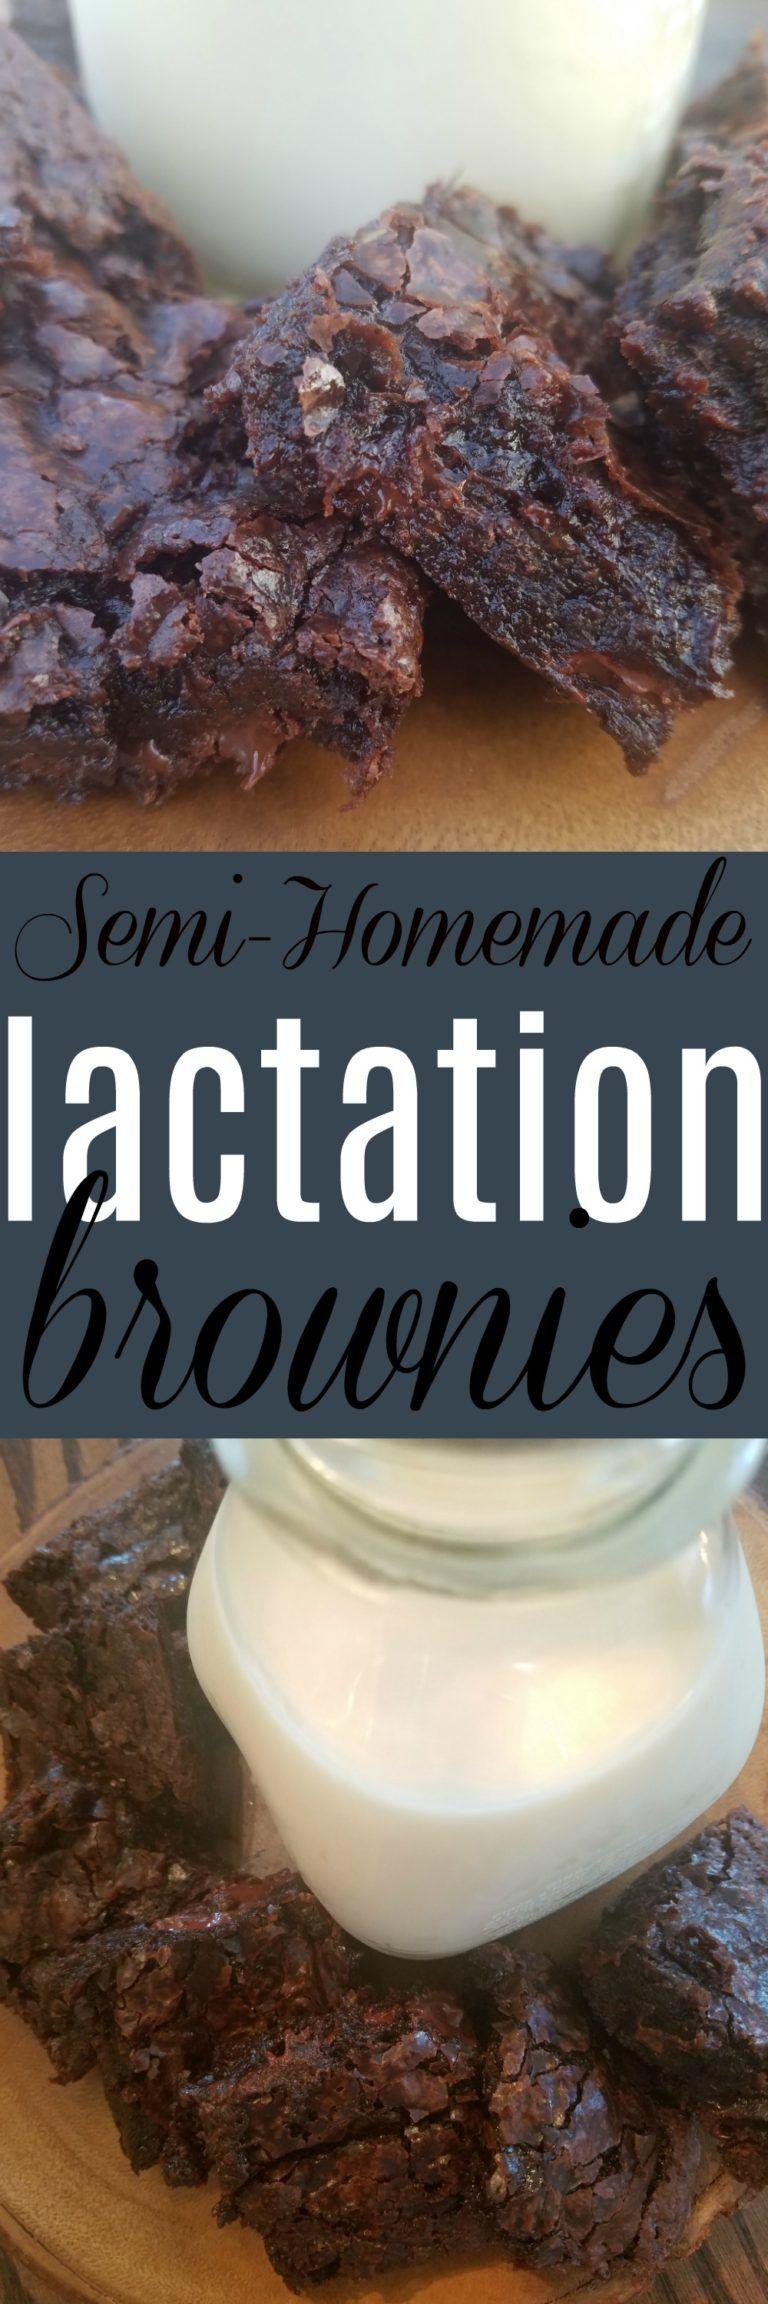 Semi-Homemade Lactation Brownies | Lactation cookies, Milk ...